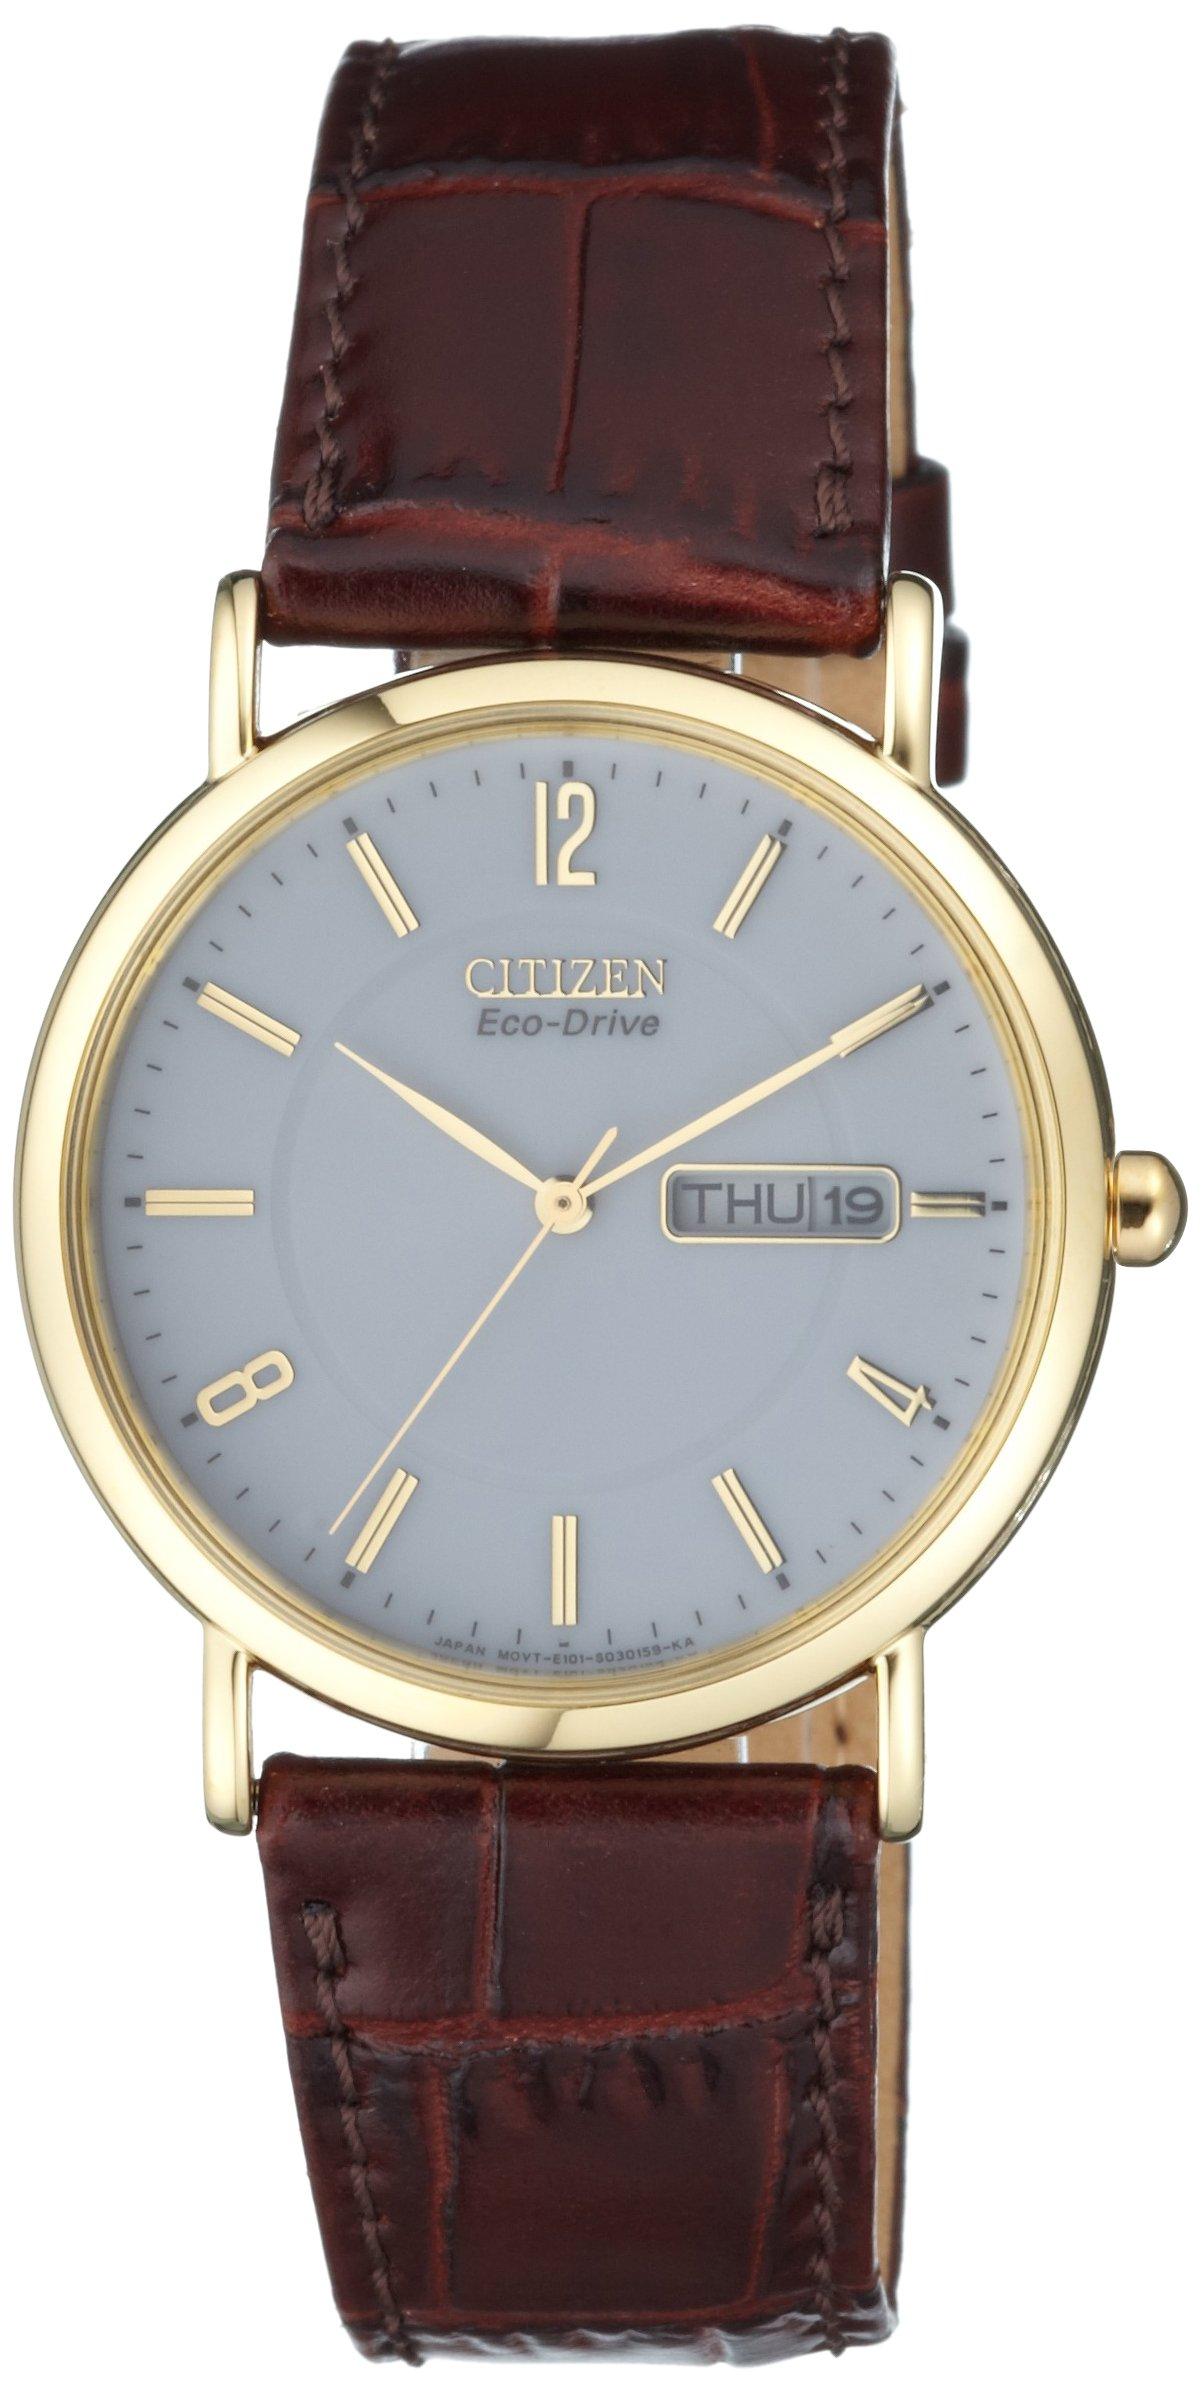 Herren Analog Quarz Uhr mit Leder Armband BM8243-05AE